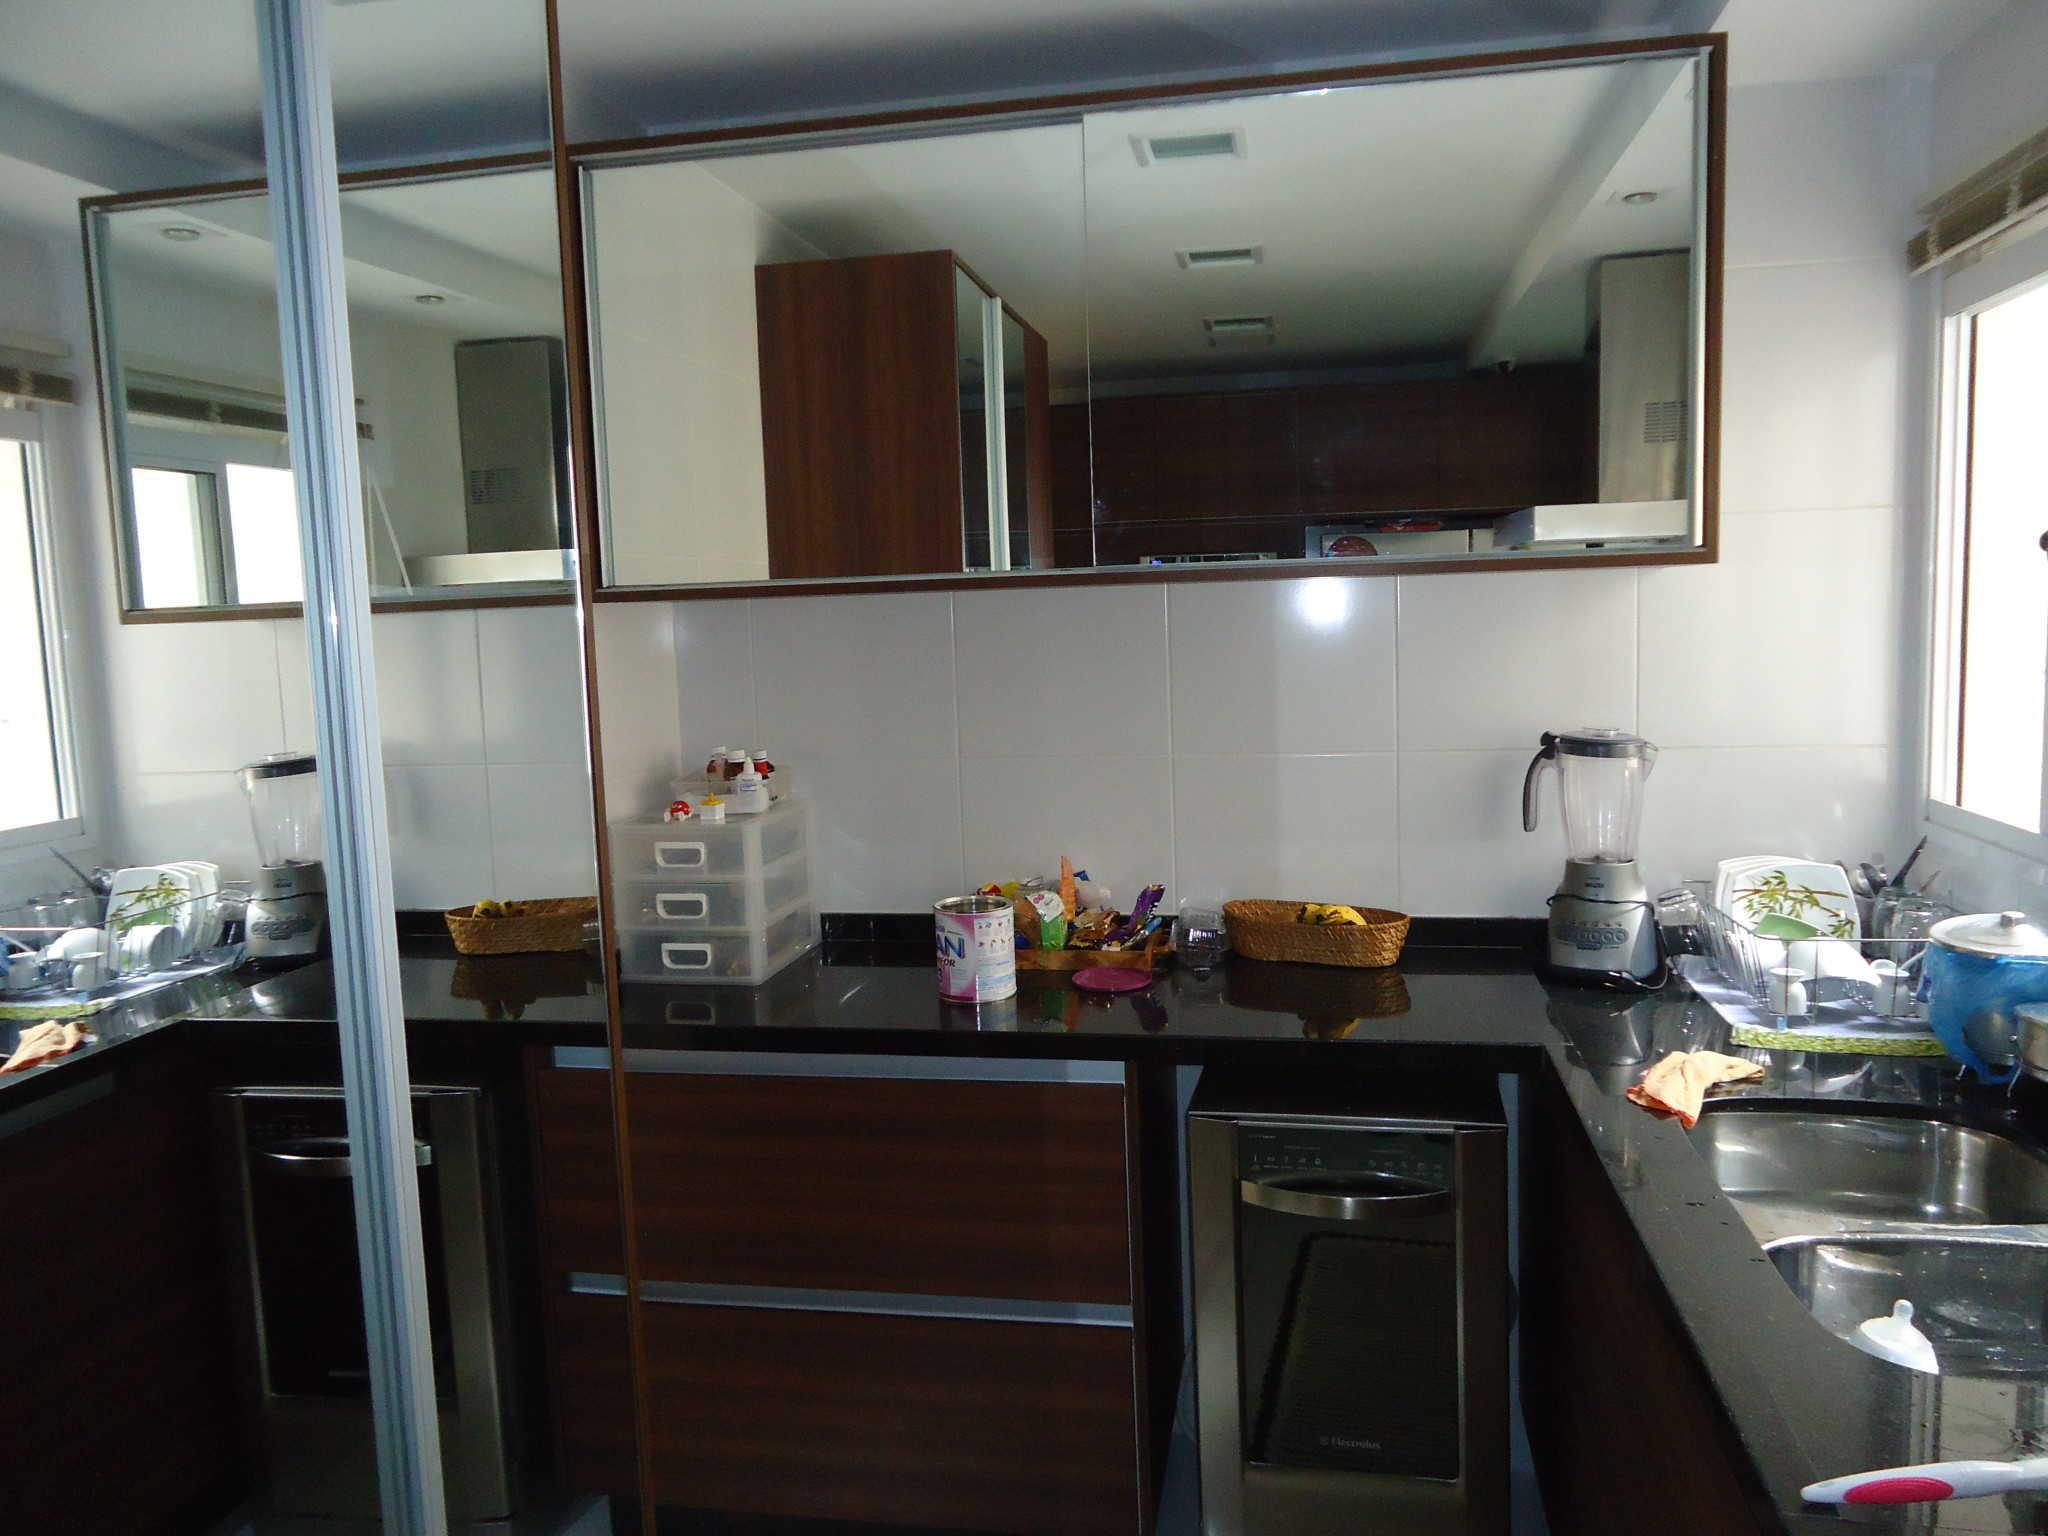 Cozinha Gourmet Gabinete Marcenaria ROC Projetos  #644132 2048 1536